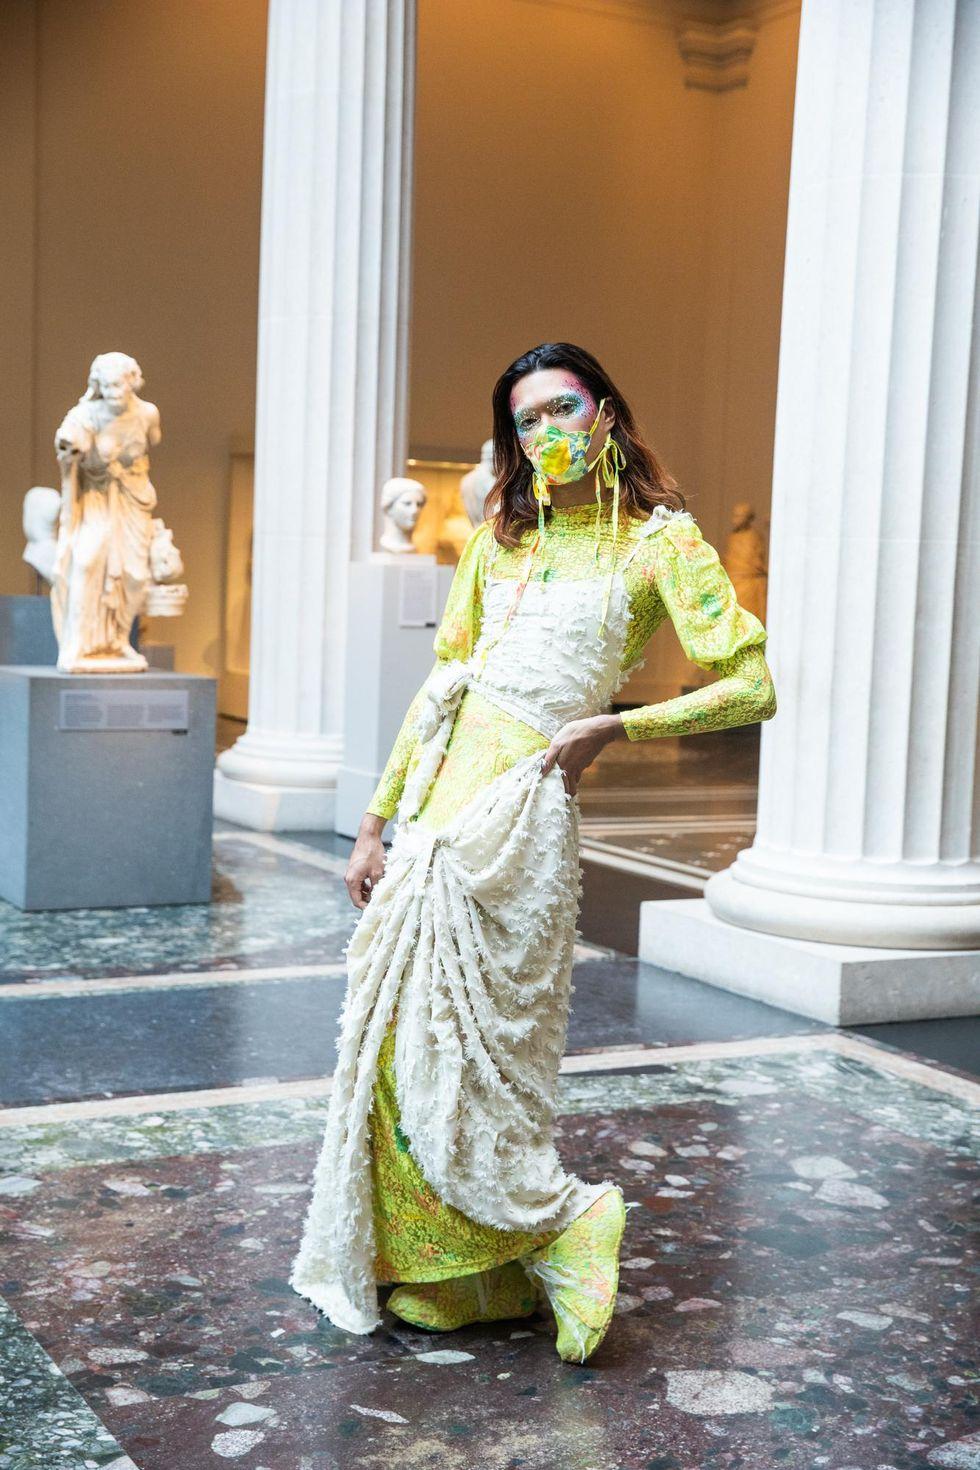 West Dakota Brings Collina Strada to Life at the Met